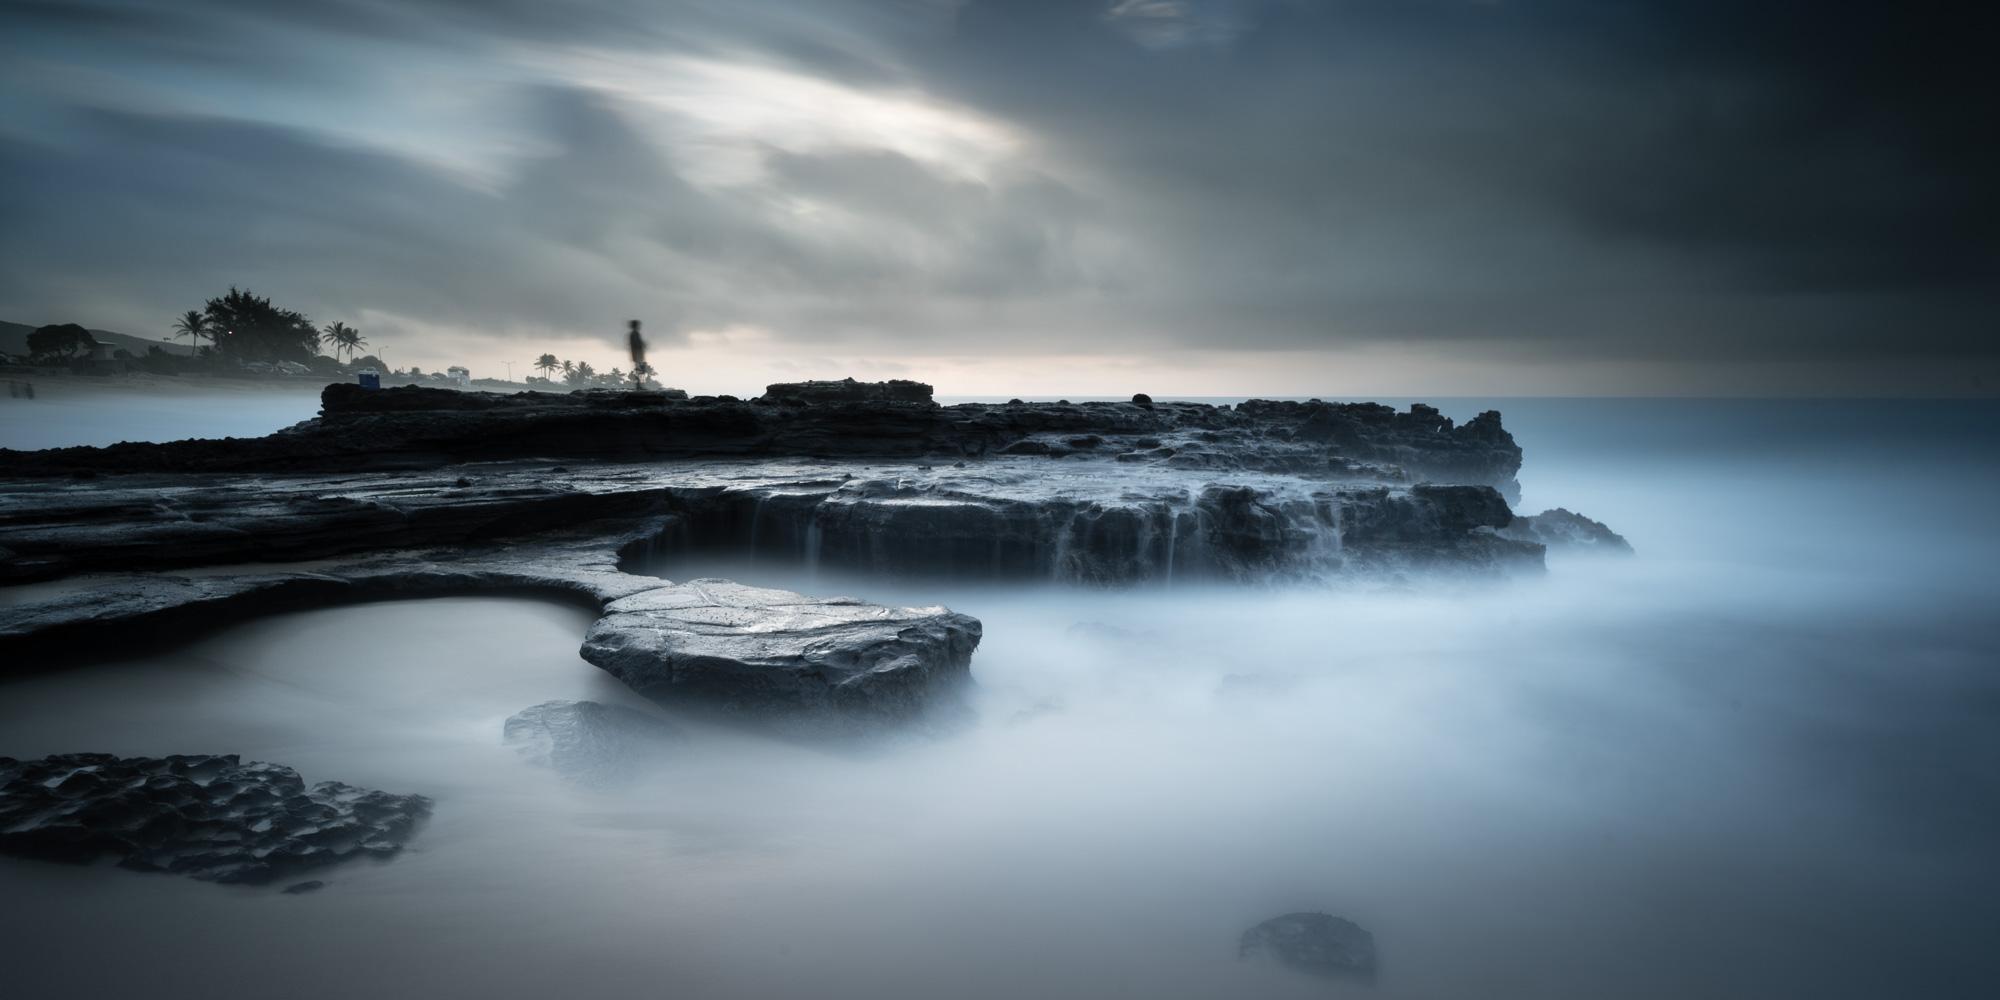 Sandy Beach Park Lee Filter Big Stopper & 3 stop medium grad Sony A7S II |  181 sec. |  f/14|  ISO 50  |  Zeiss Batis 18mm  Edited in Lightroom CC 2015  Copyright 2016 Ryan Sakamoto, All rights reserved